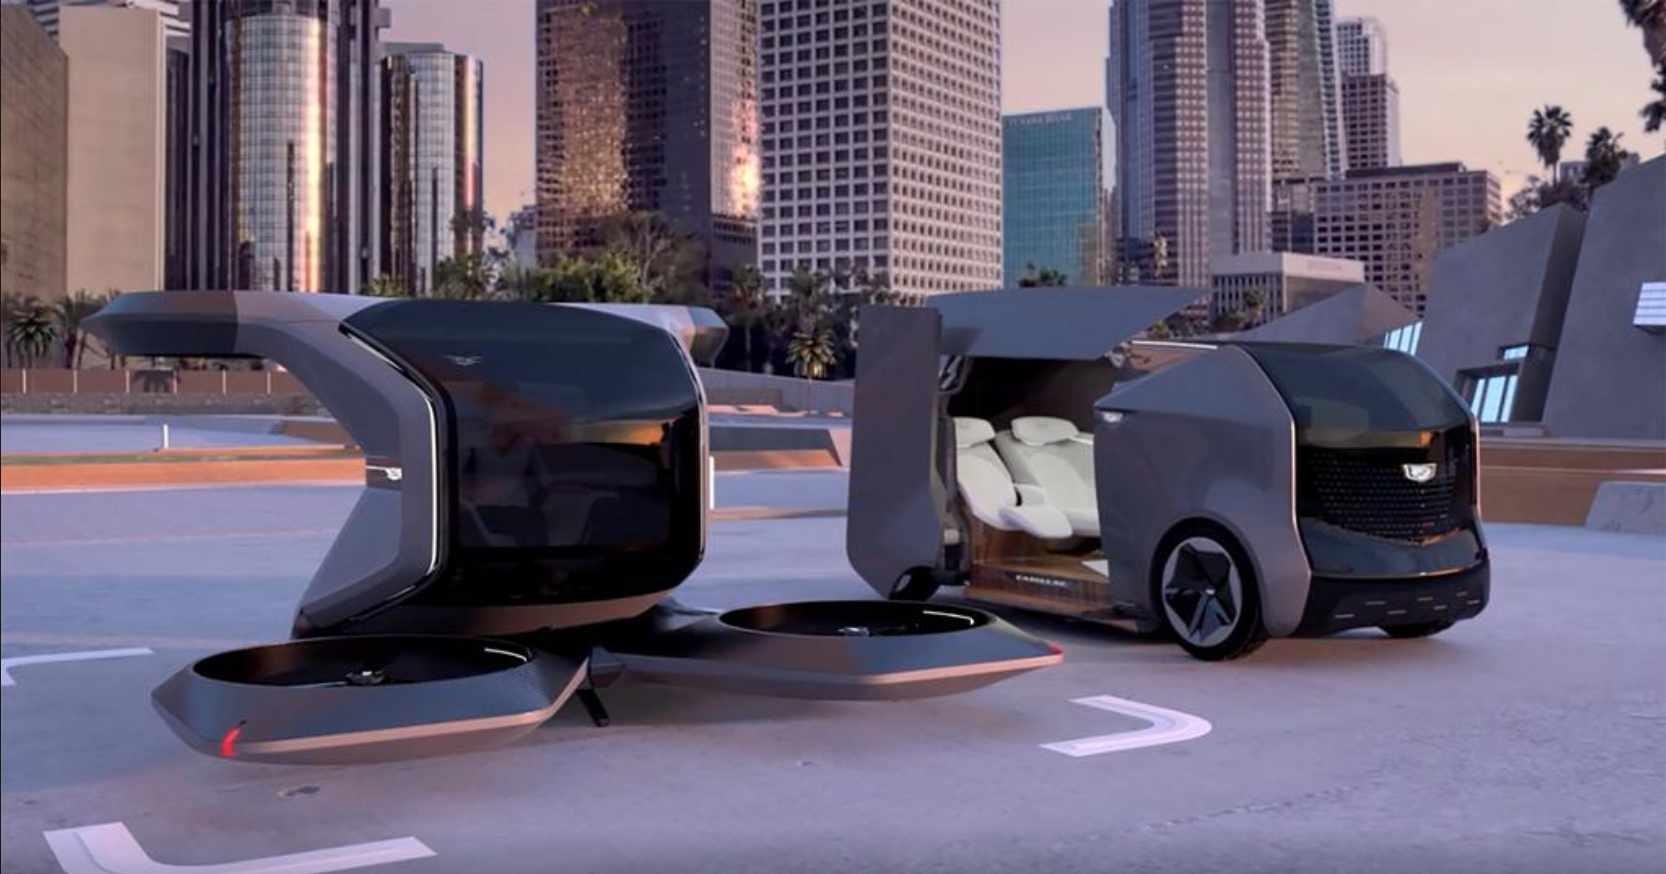 cadillac flying autonomous limit rooftop